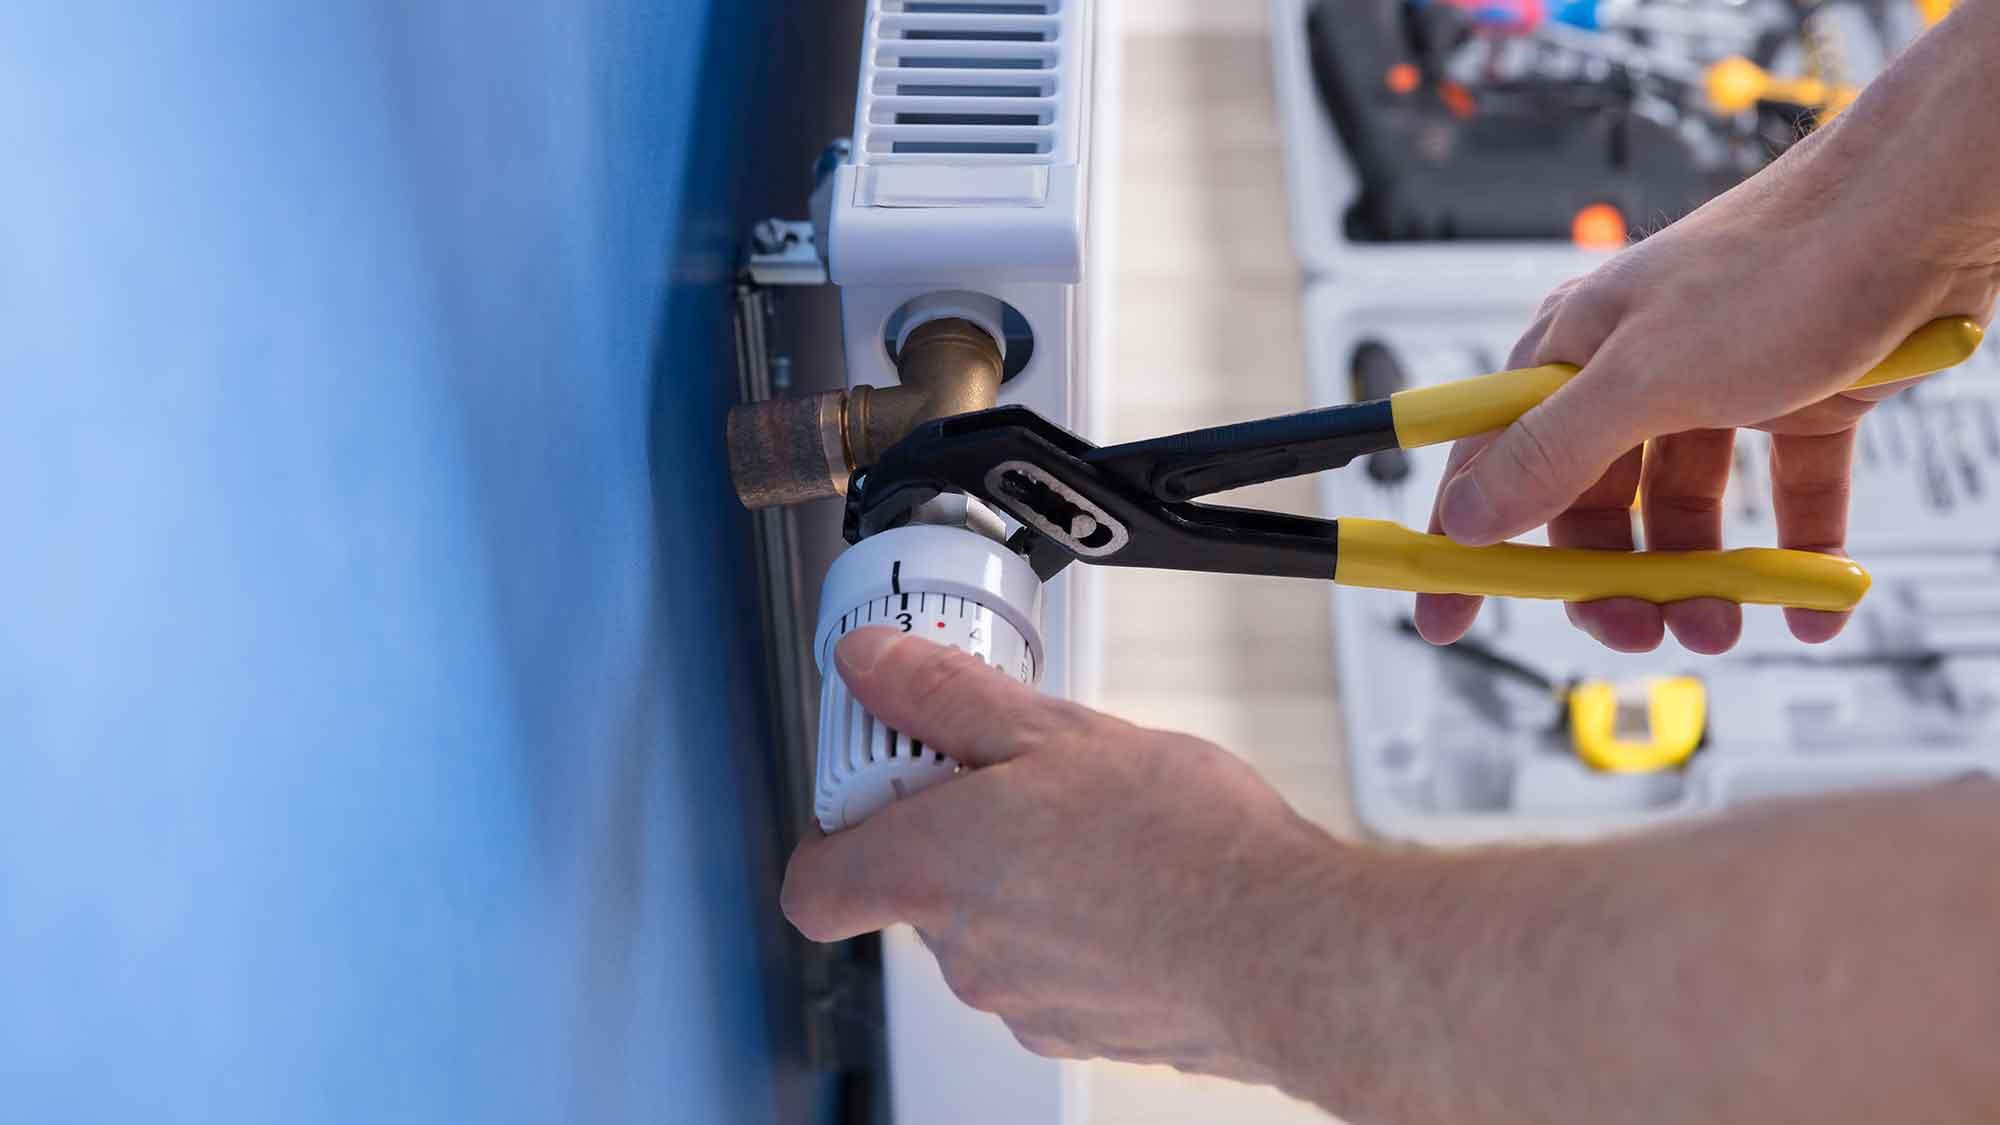 radiator installation essex maintenance leigh on sea wrench